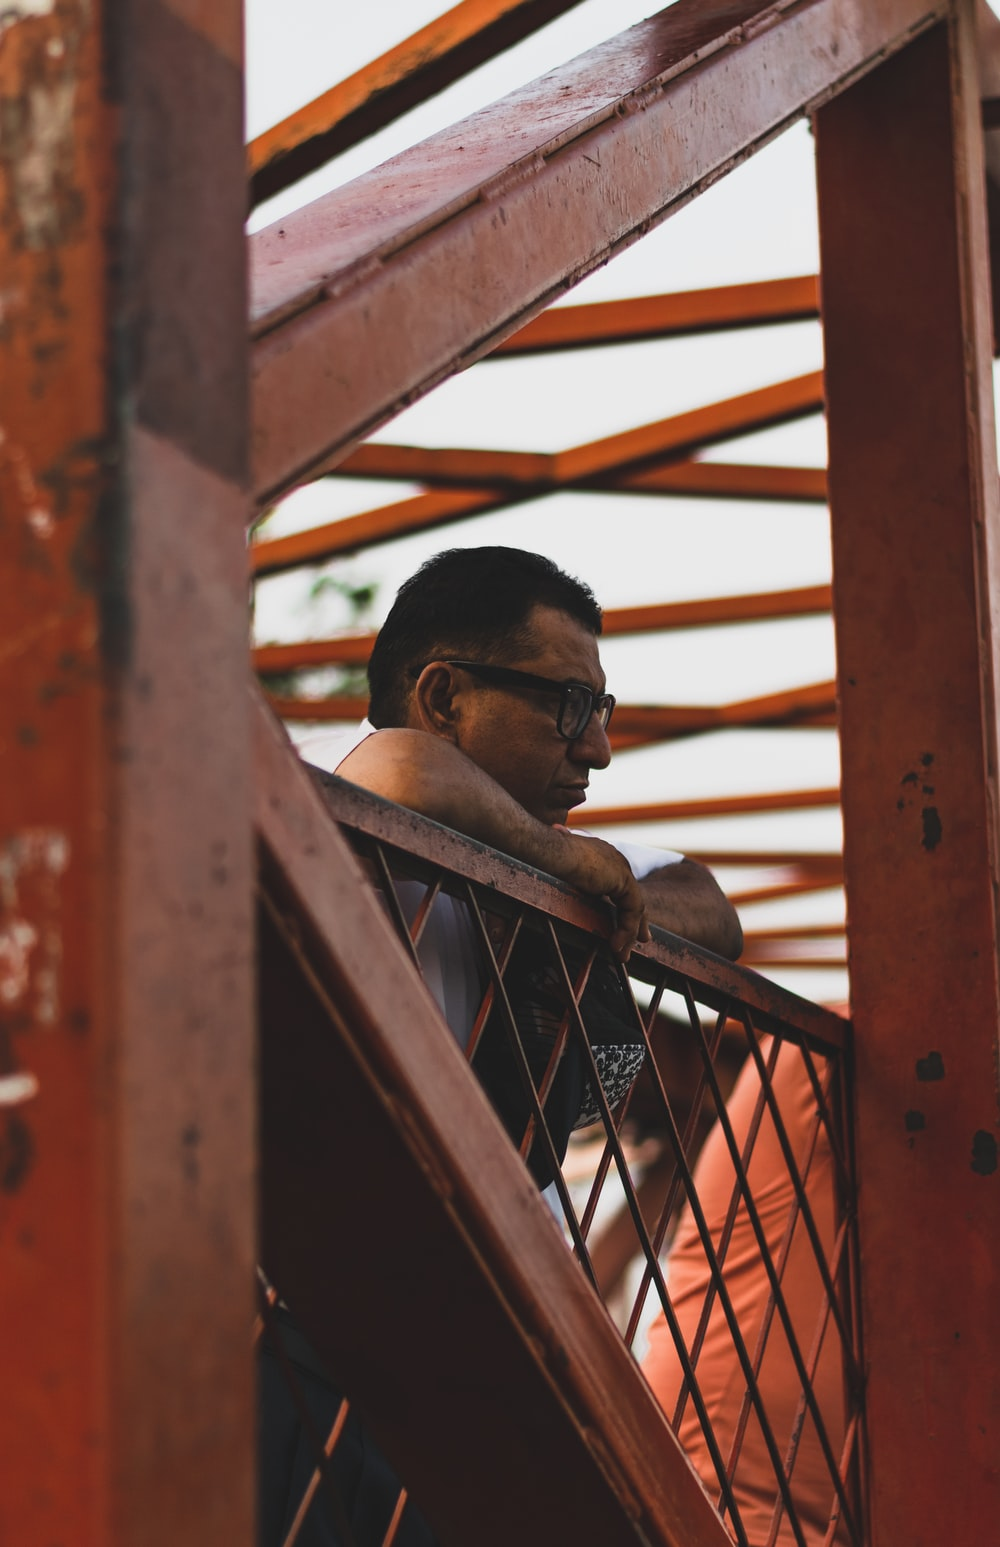 man standing near orange railings